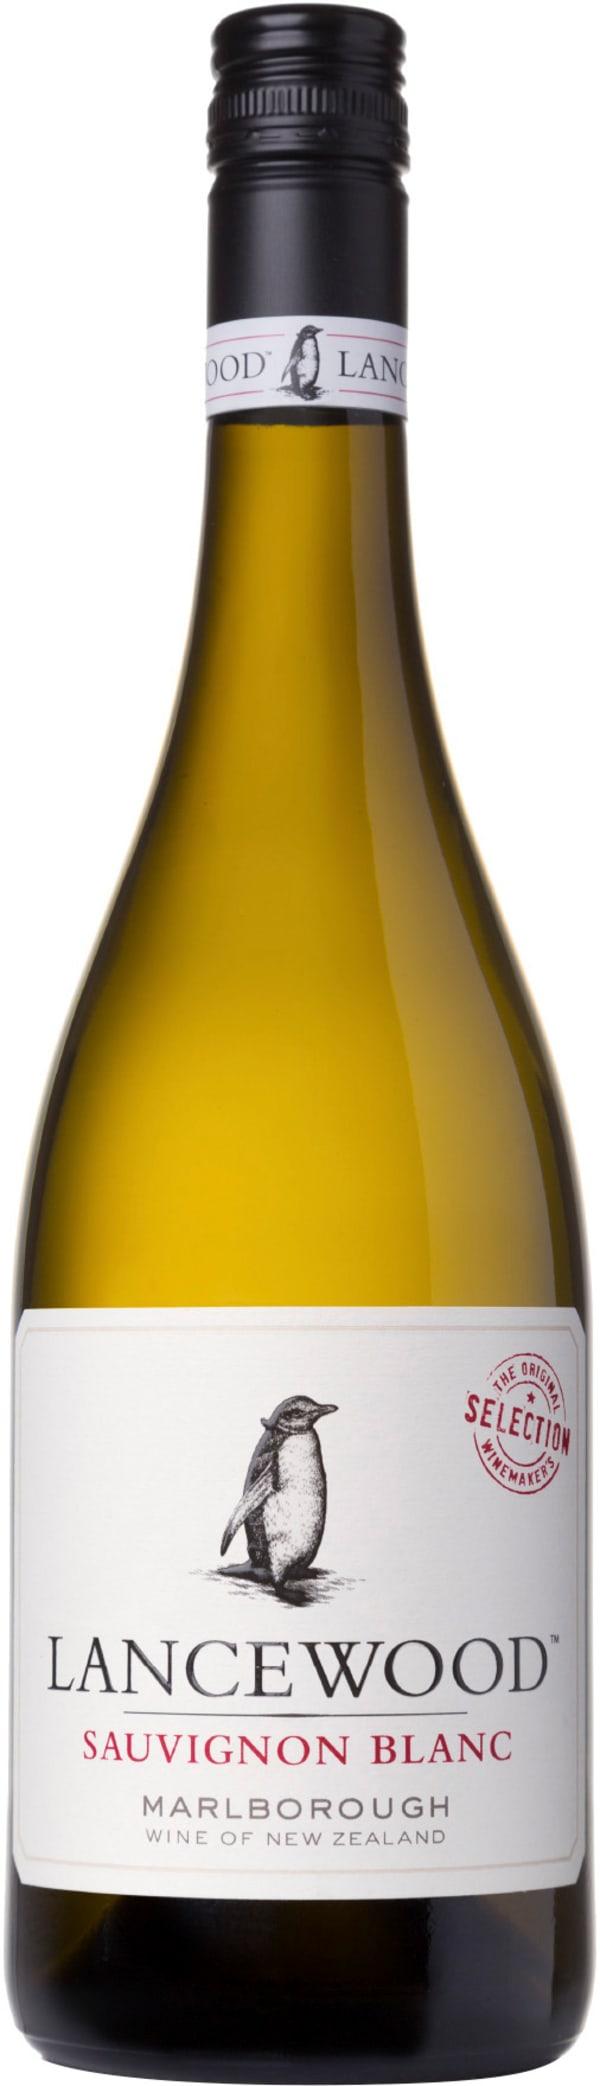 Lancewood Sauvignon Blanc 2019